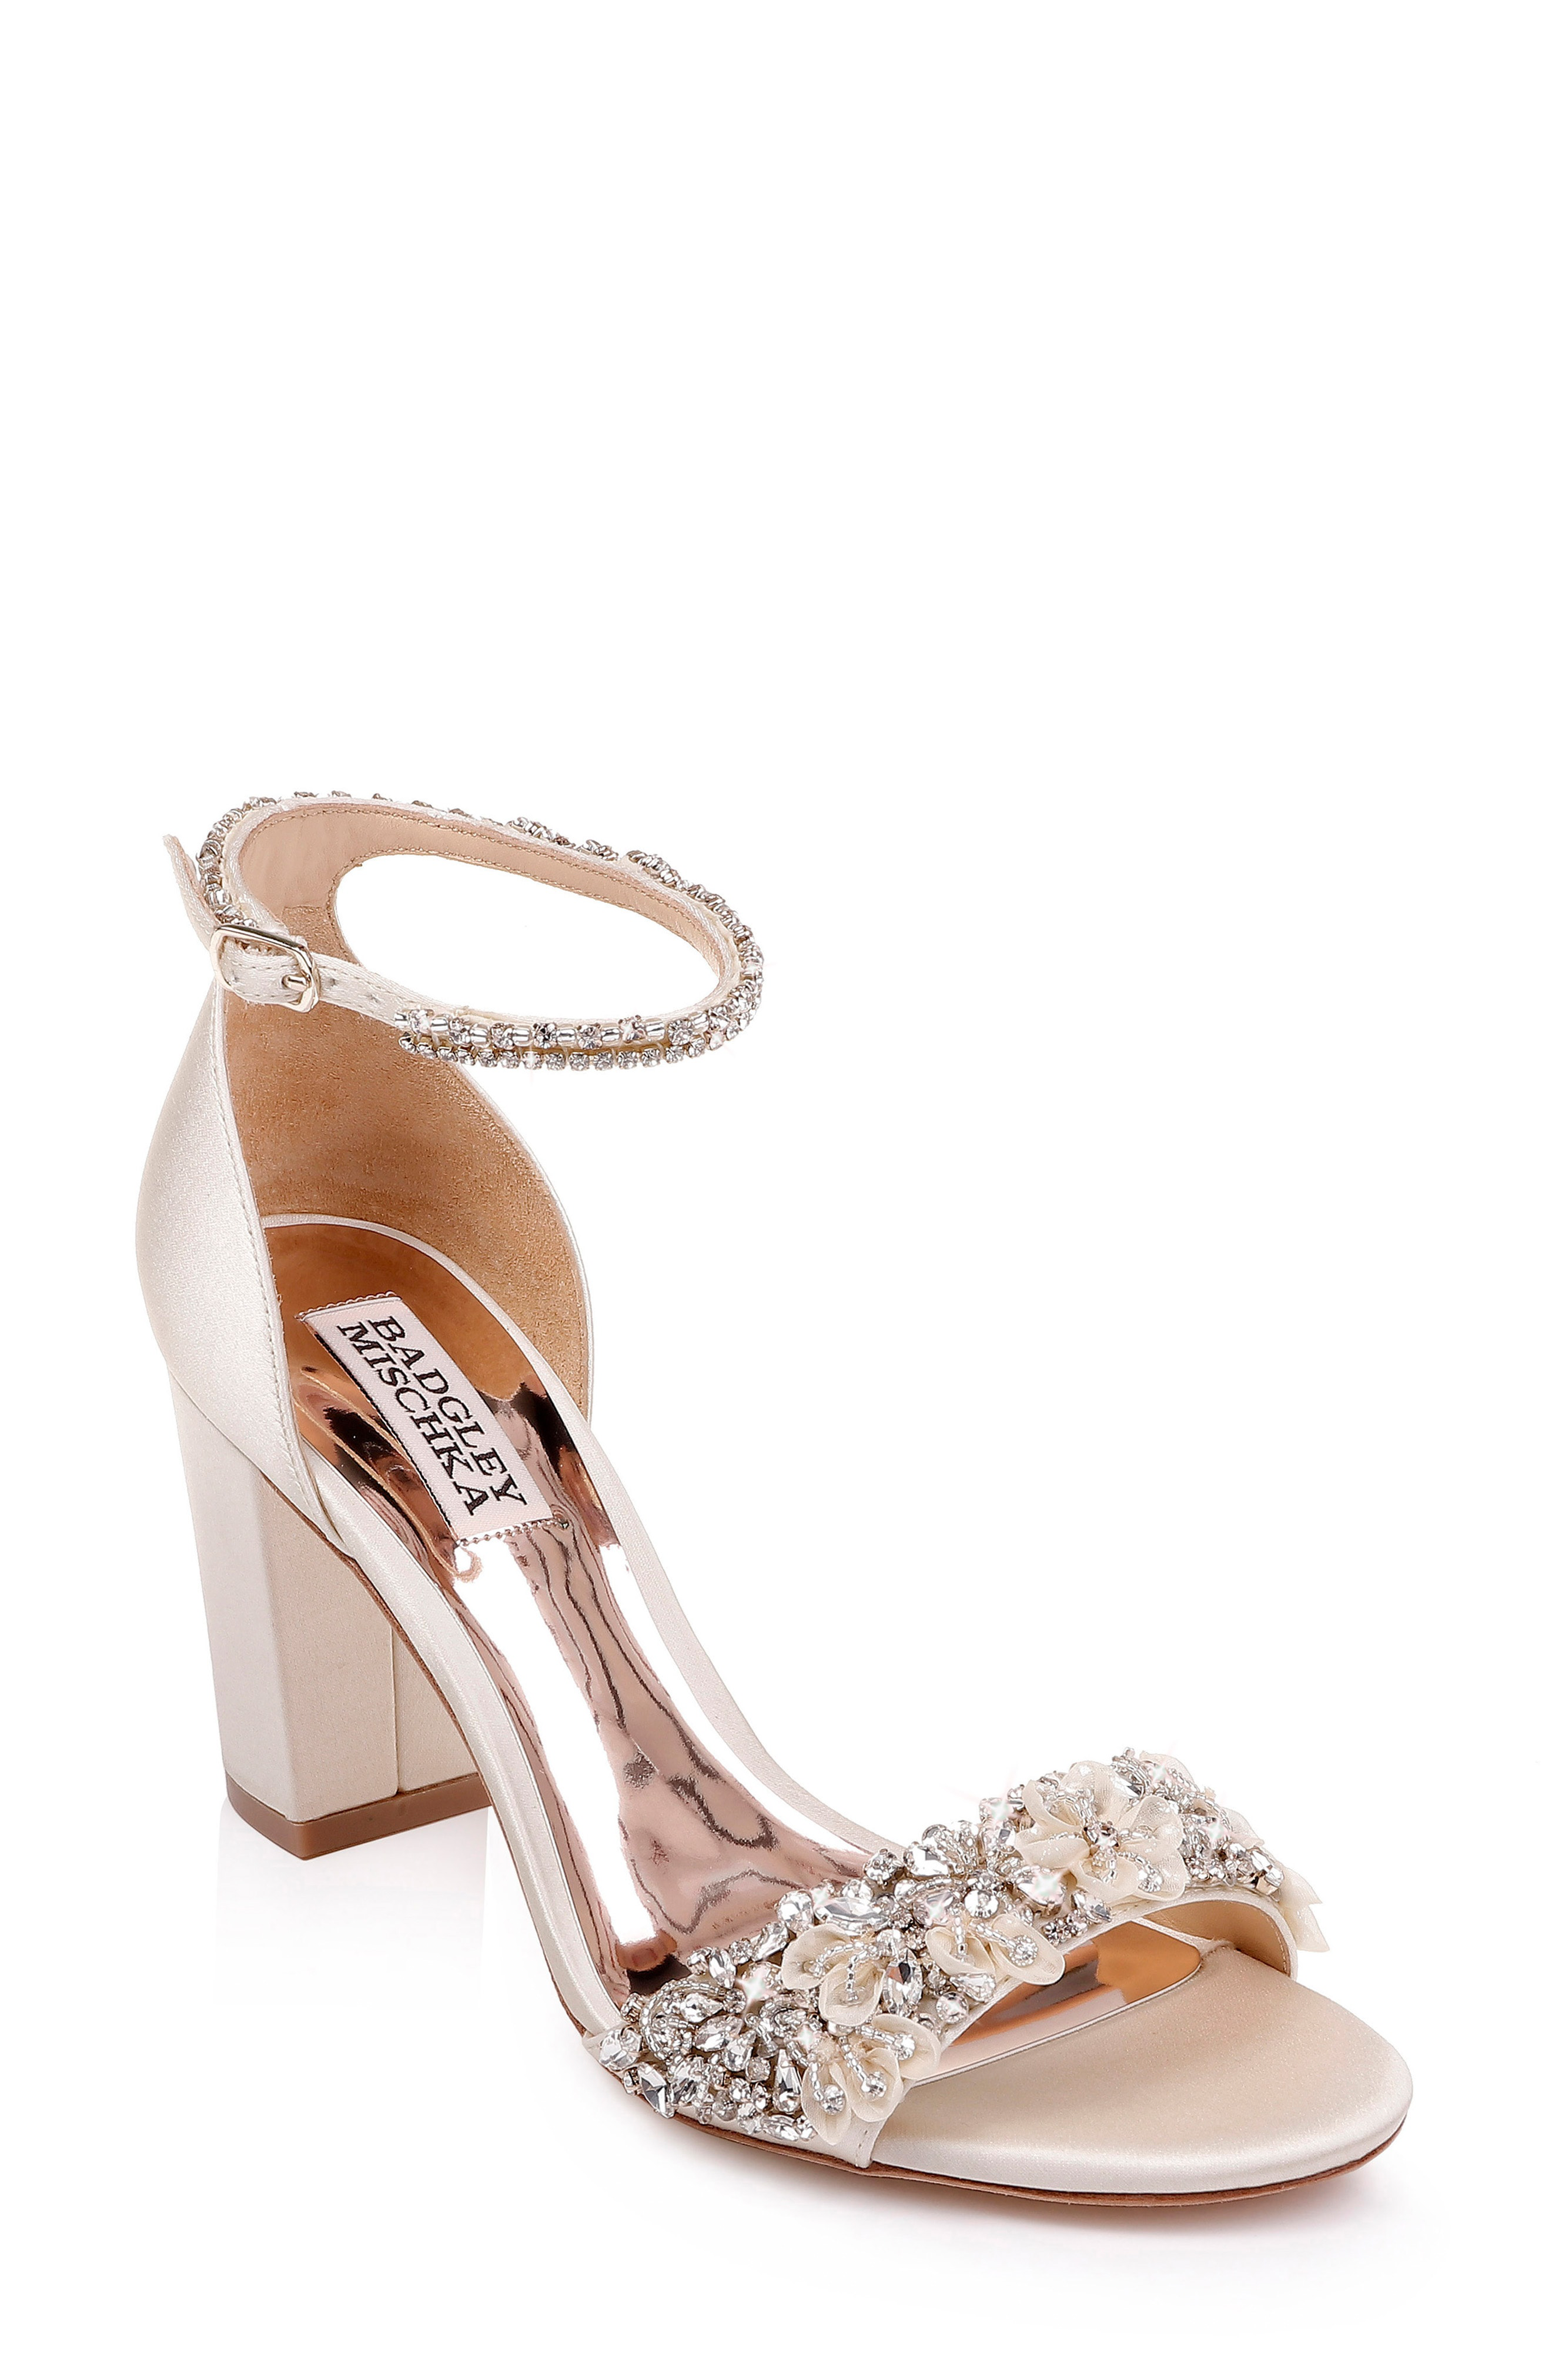 8388dc703 Badgley Mischka Women S Finesse Embellished Block Heel Sandals In Ivory  Satin